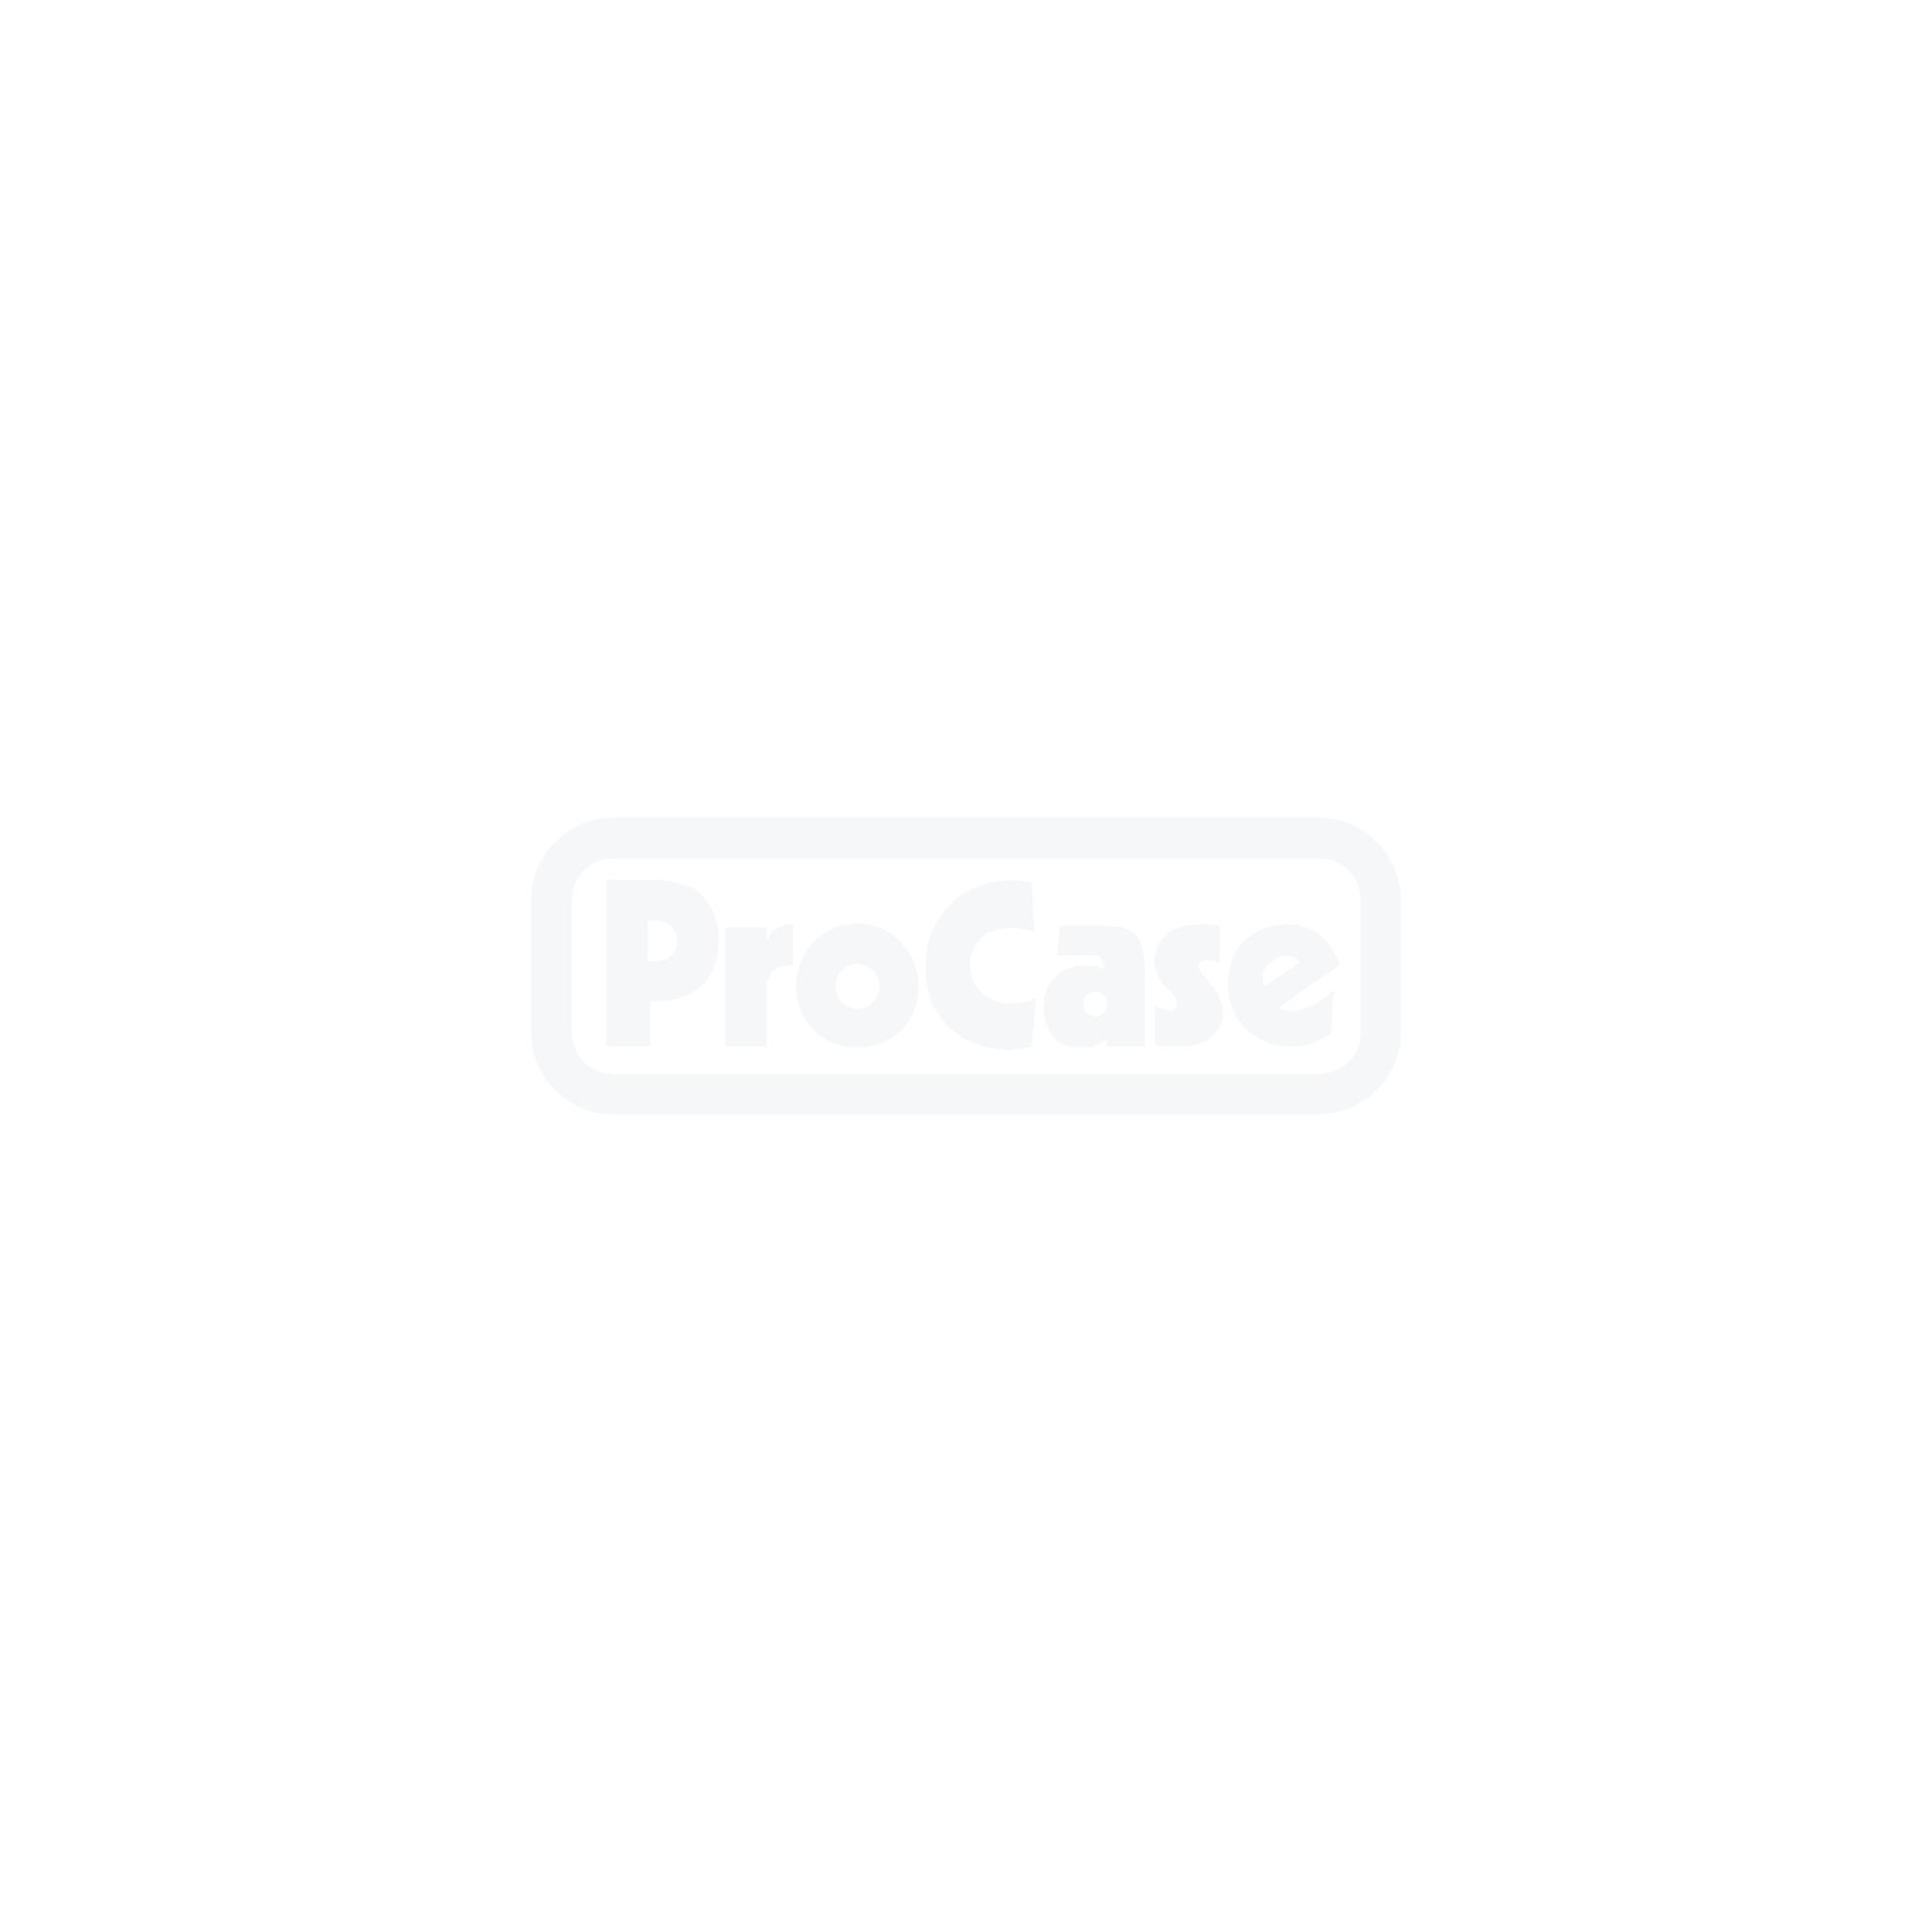 Flightcase für Panasonic TX-L37E5 2